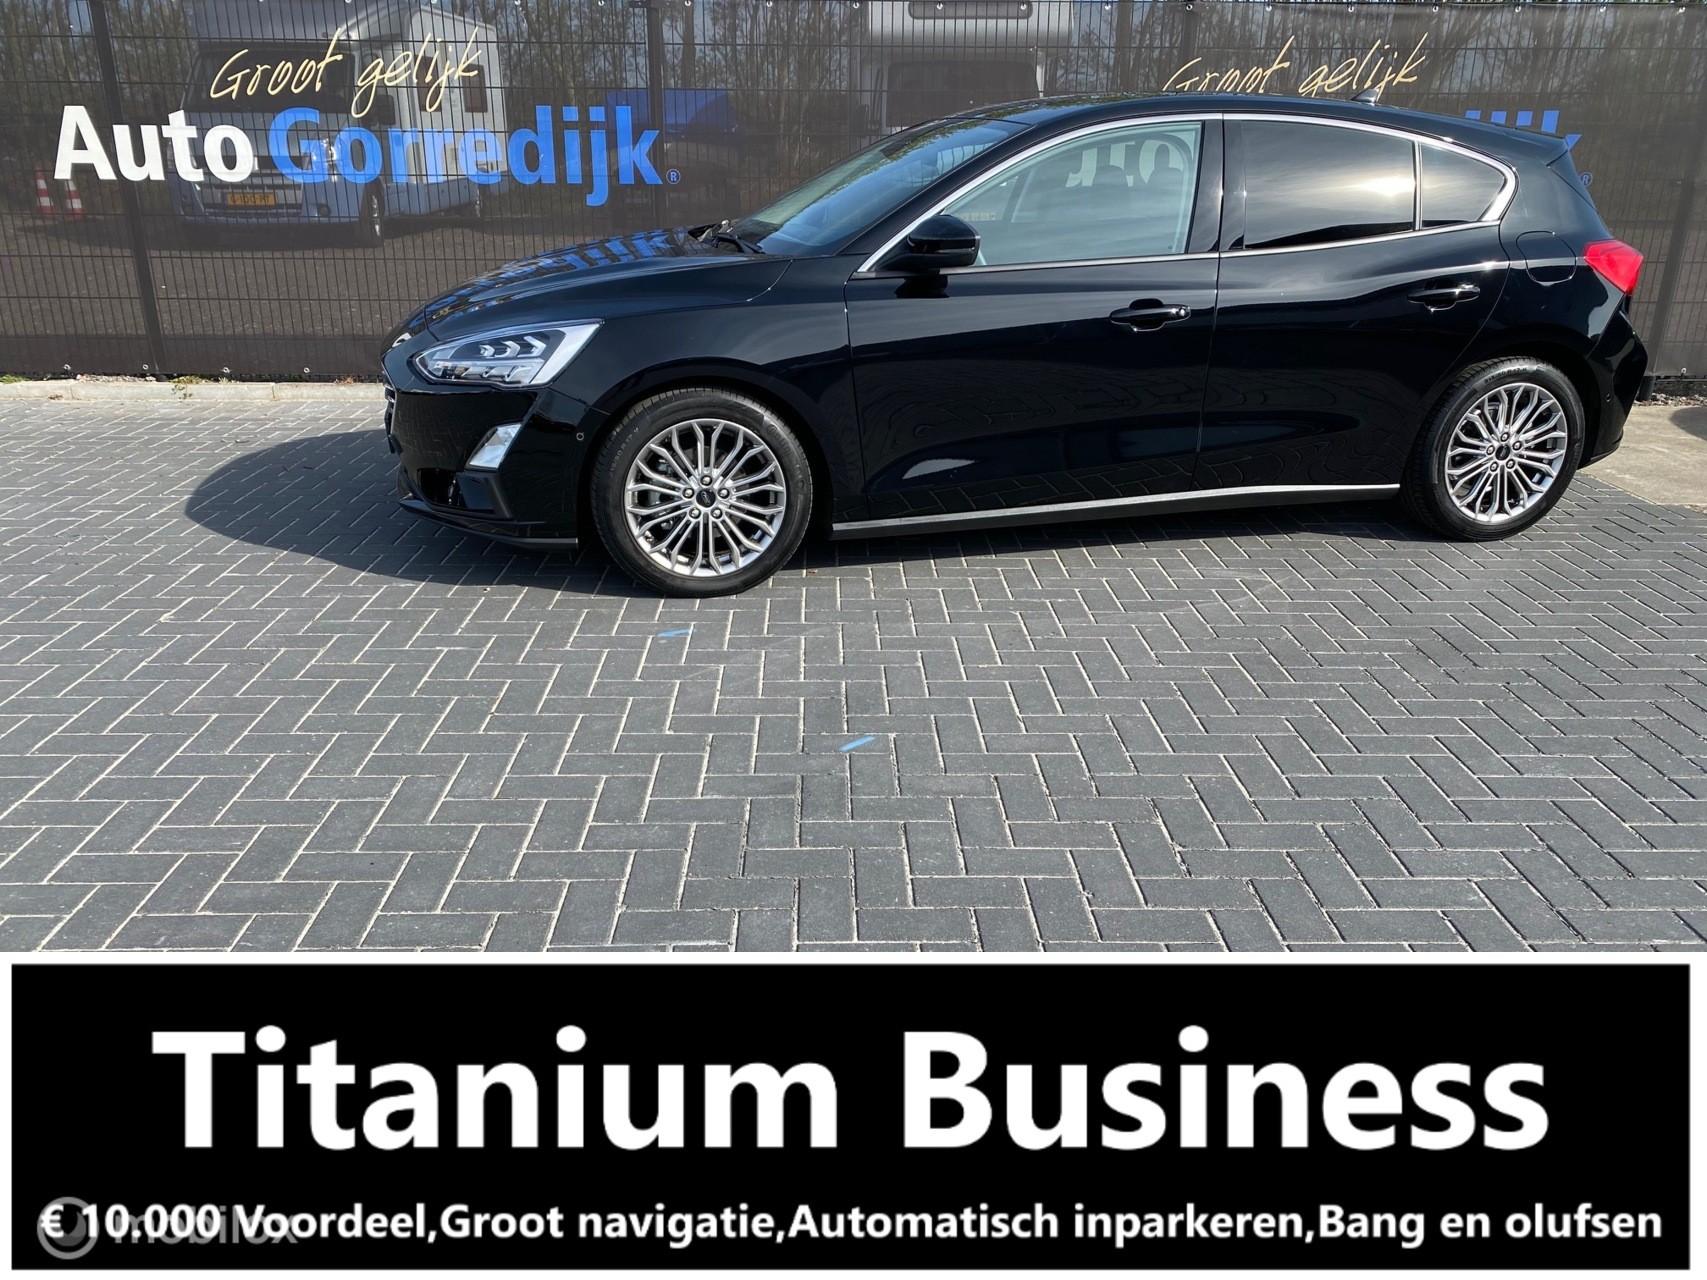 Ford Focus 1.0 EcoBoost Titanium Business B & O nw €30.000,-